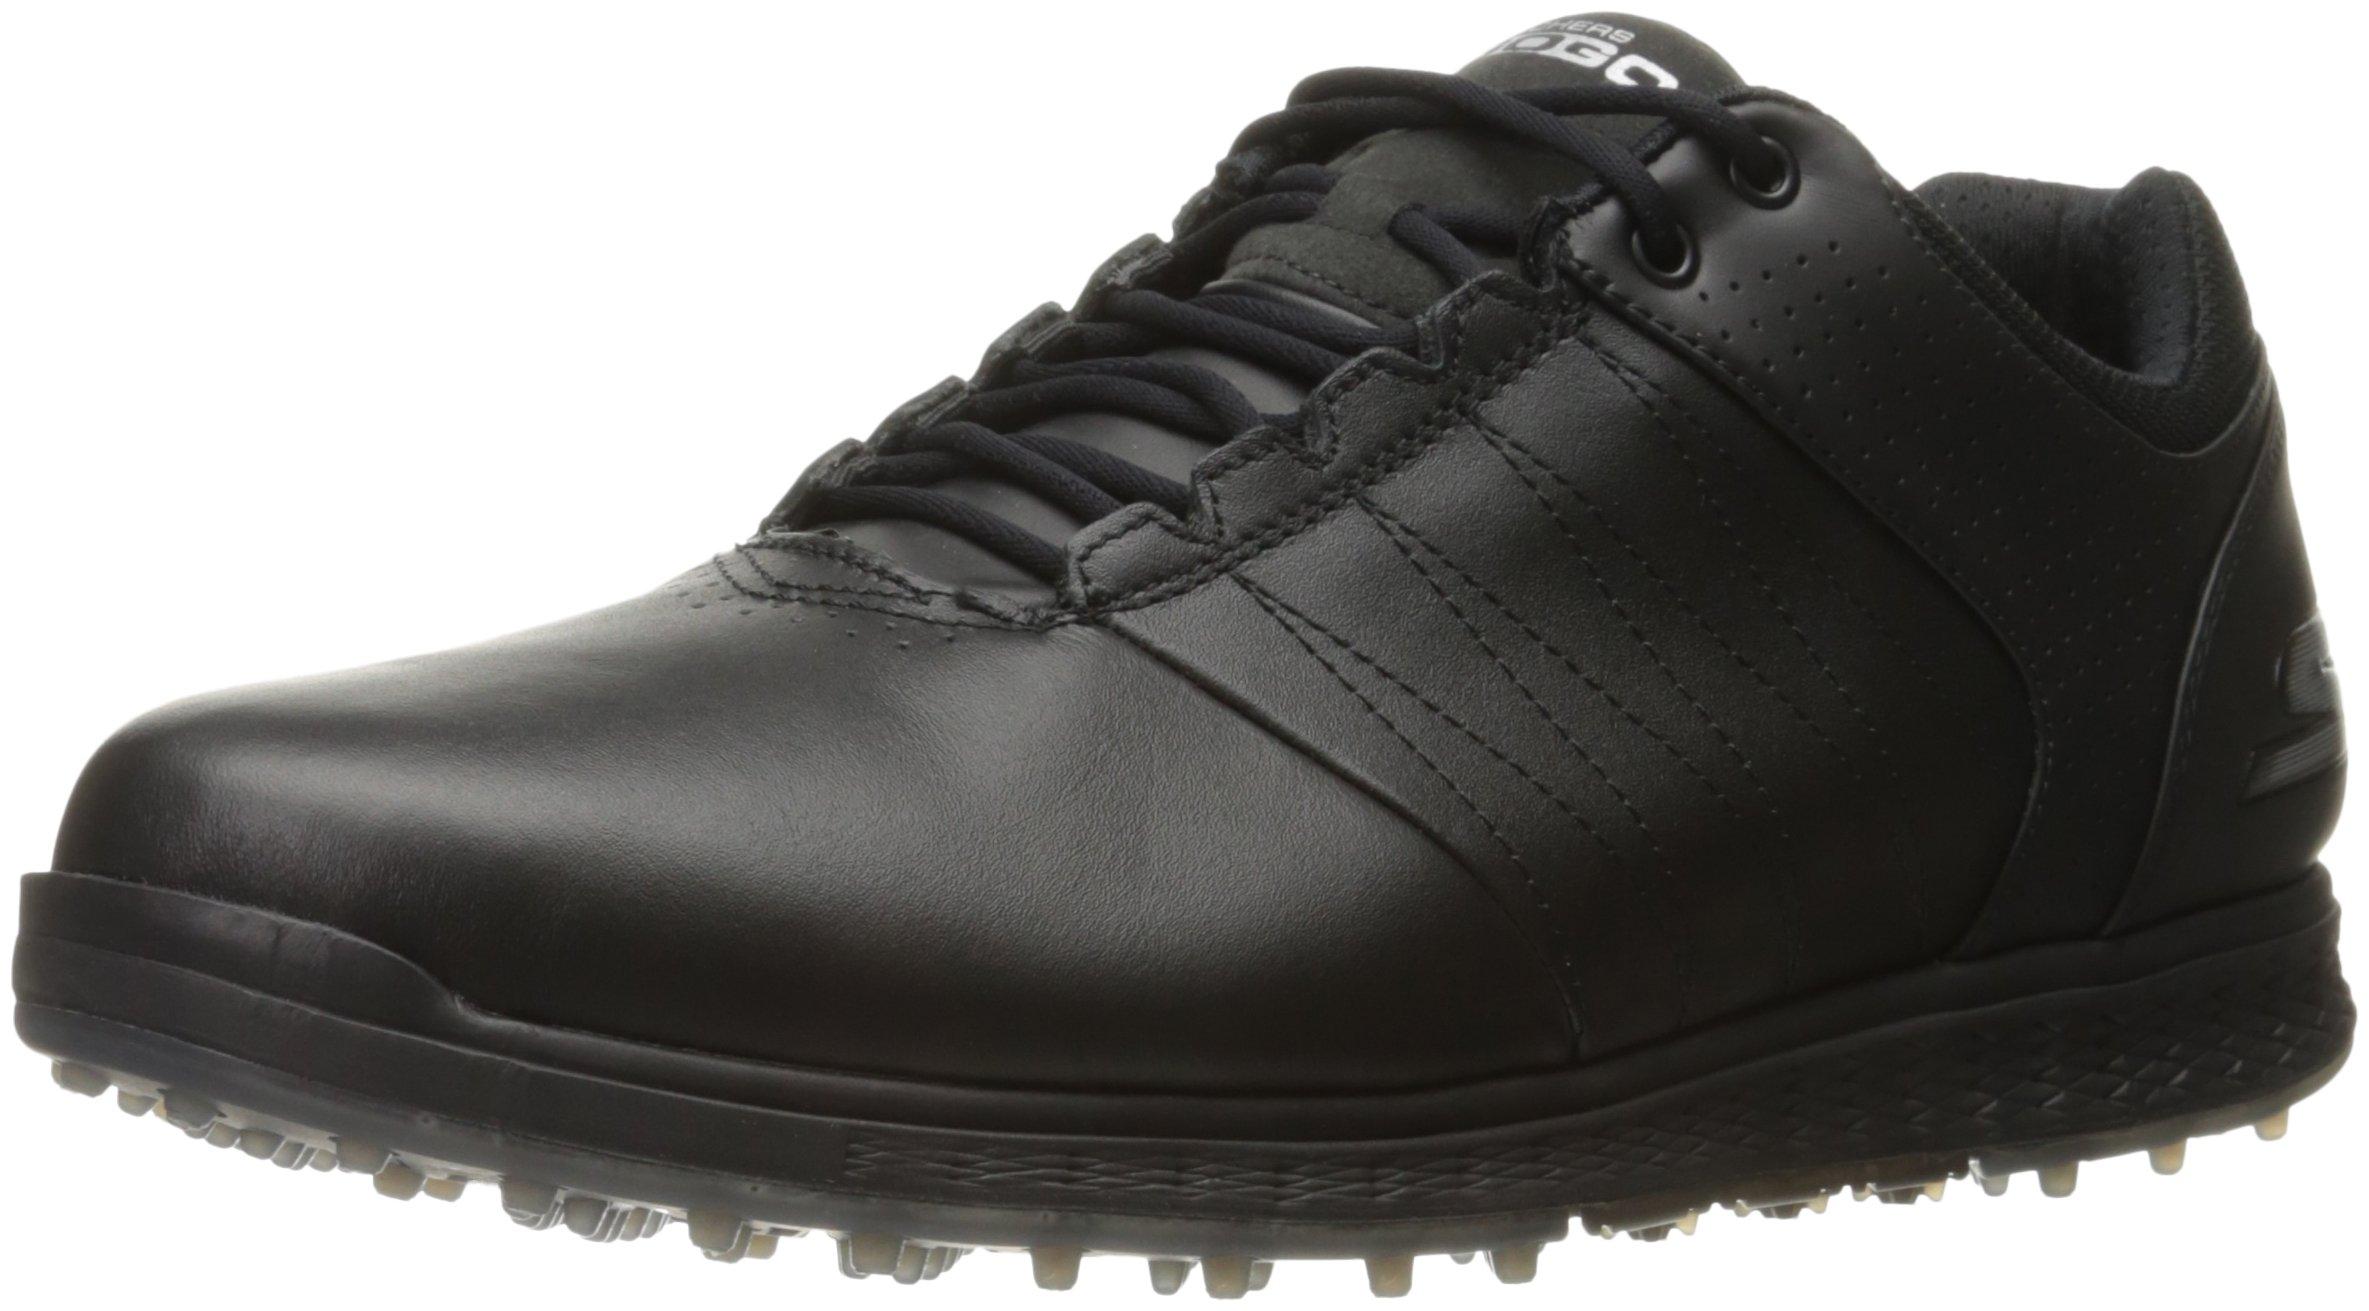 Skechers Performance Men's Go Golf Elite 2 Golf Shoe,Black,10.5 M US